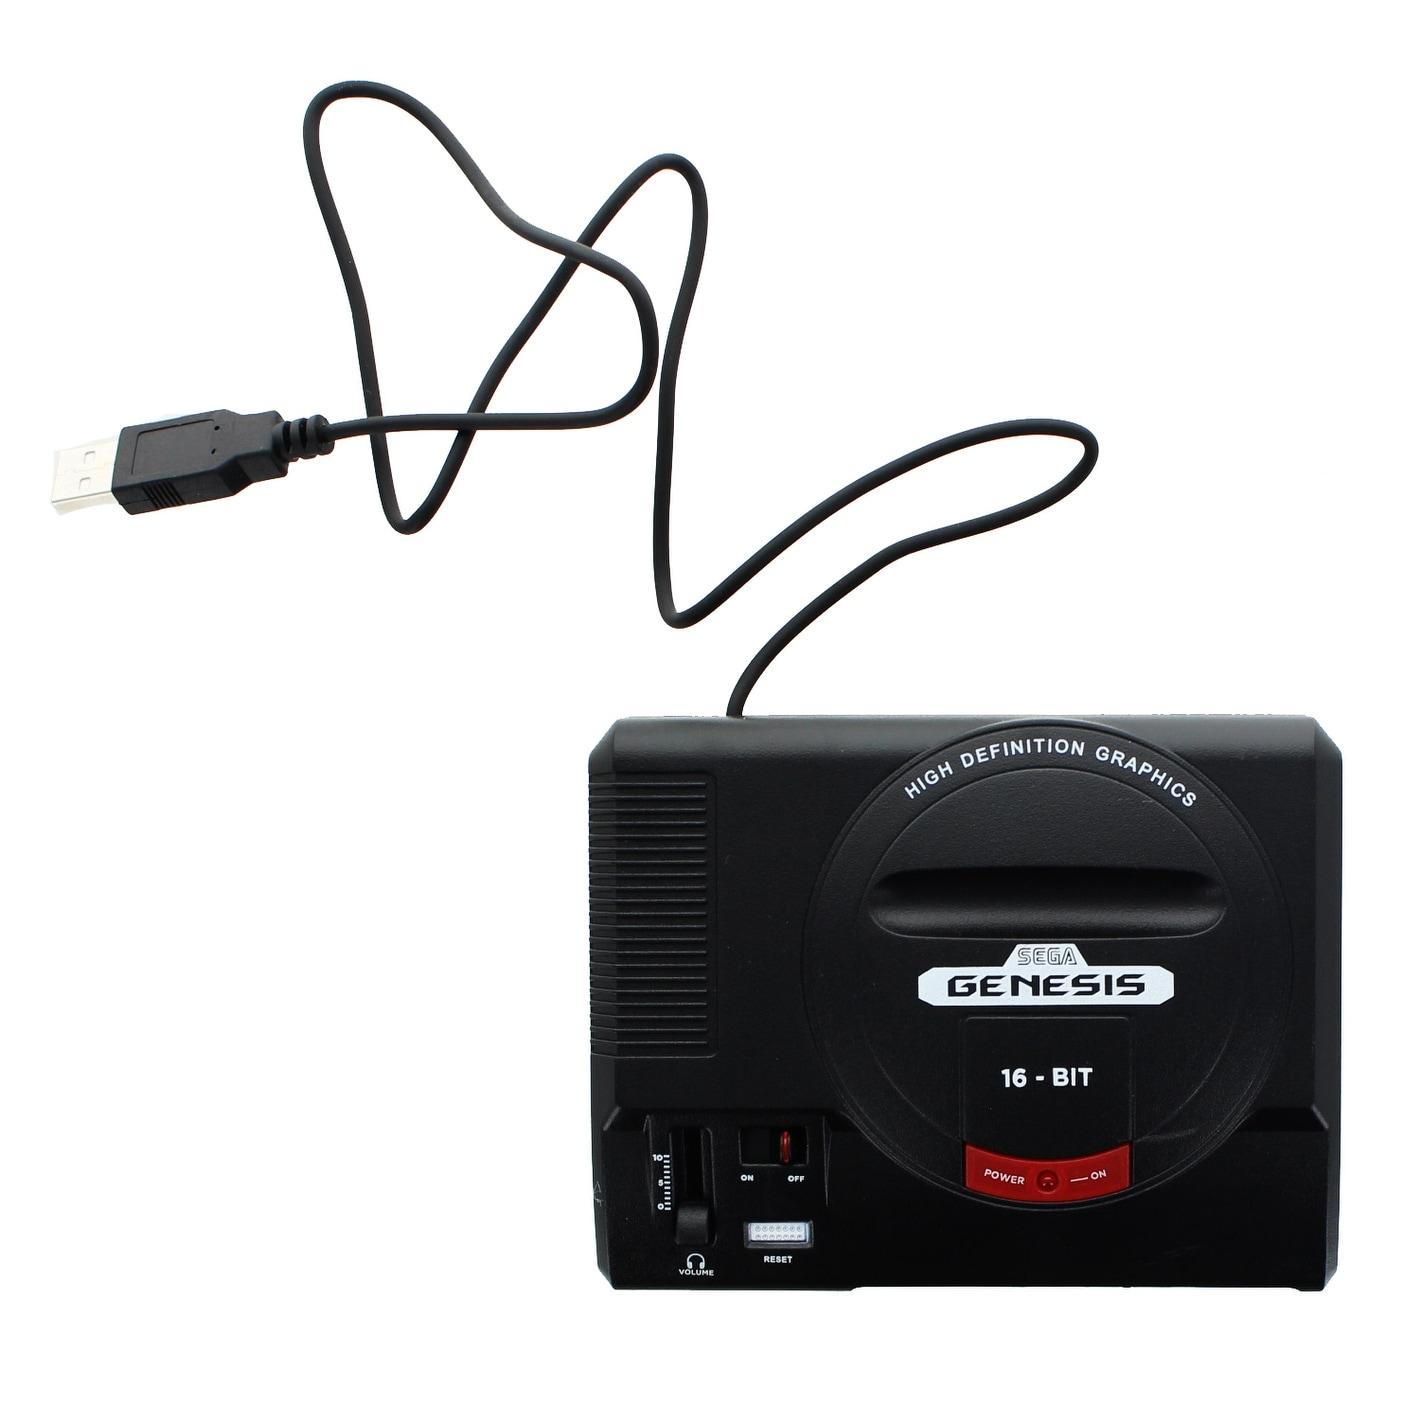 Sega Genesis 16-Bit Mini Classic Game Console USB Hub - multi -  Overstock